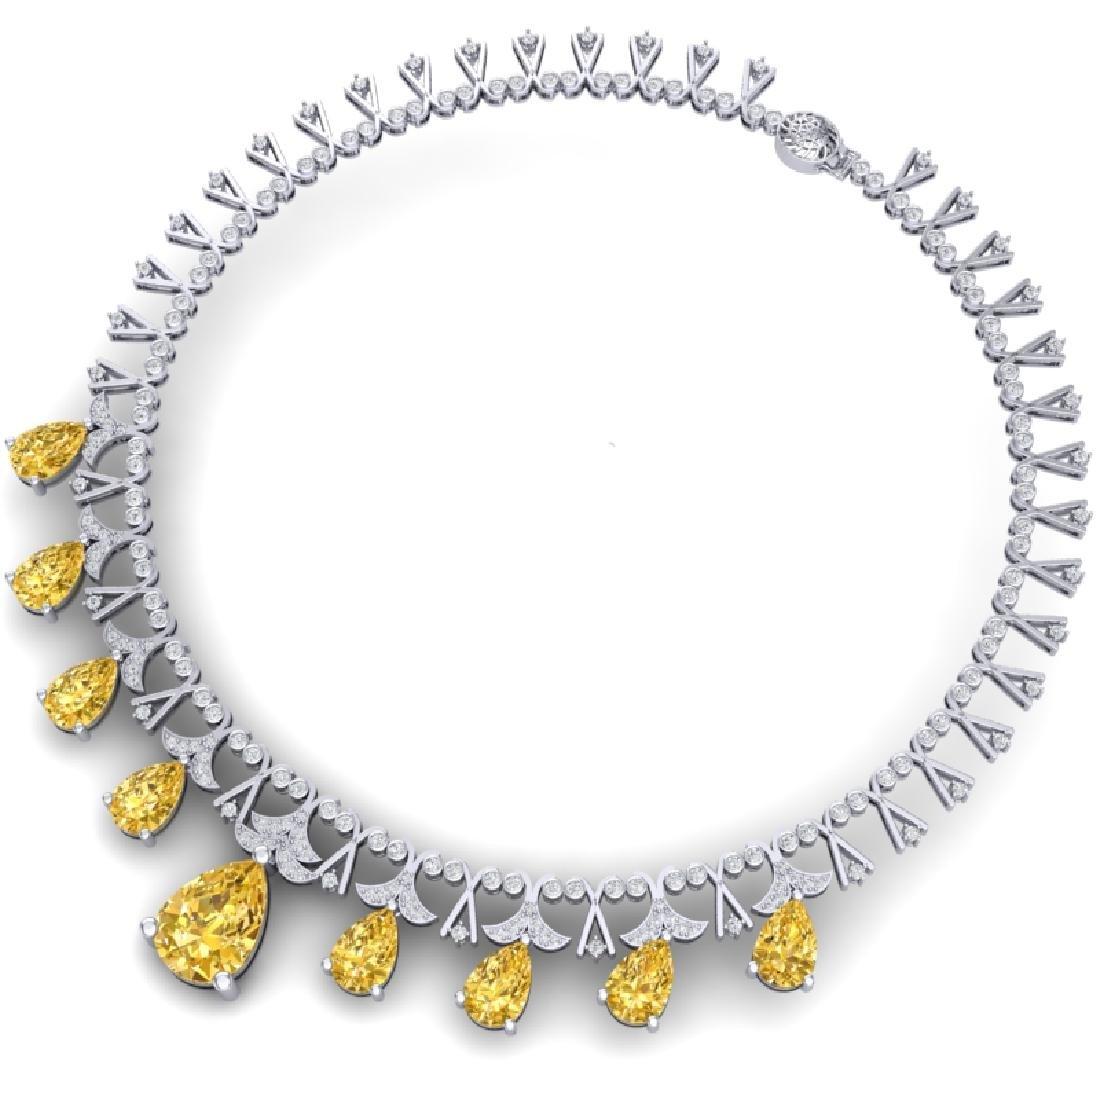 55.49 CTW Royalty Canary Citrine & VS Diamond Necklace - 3